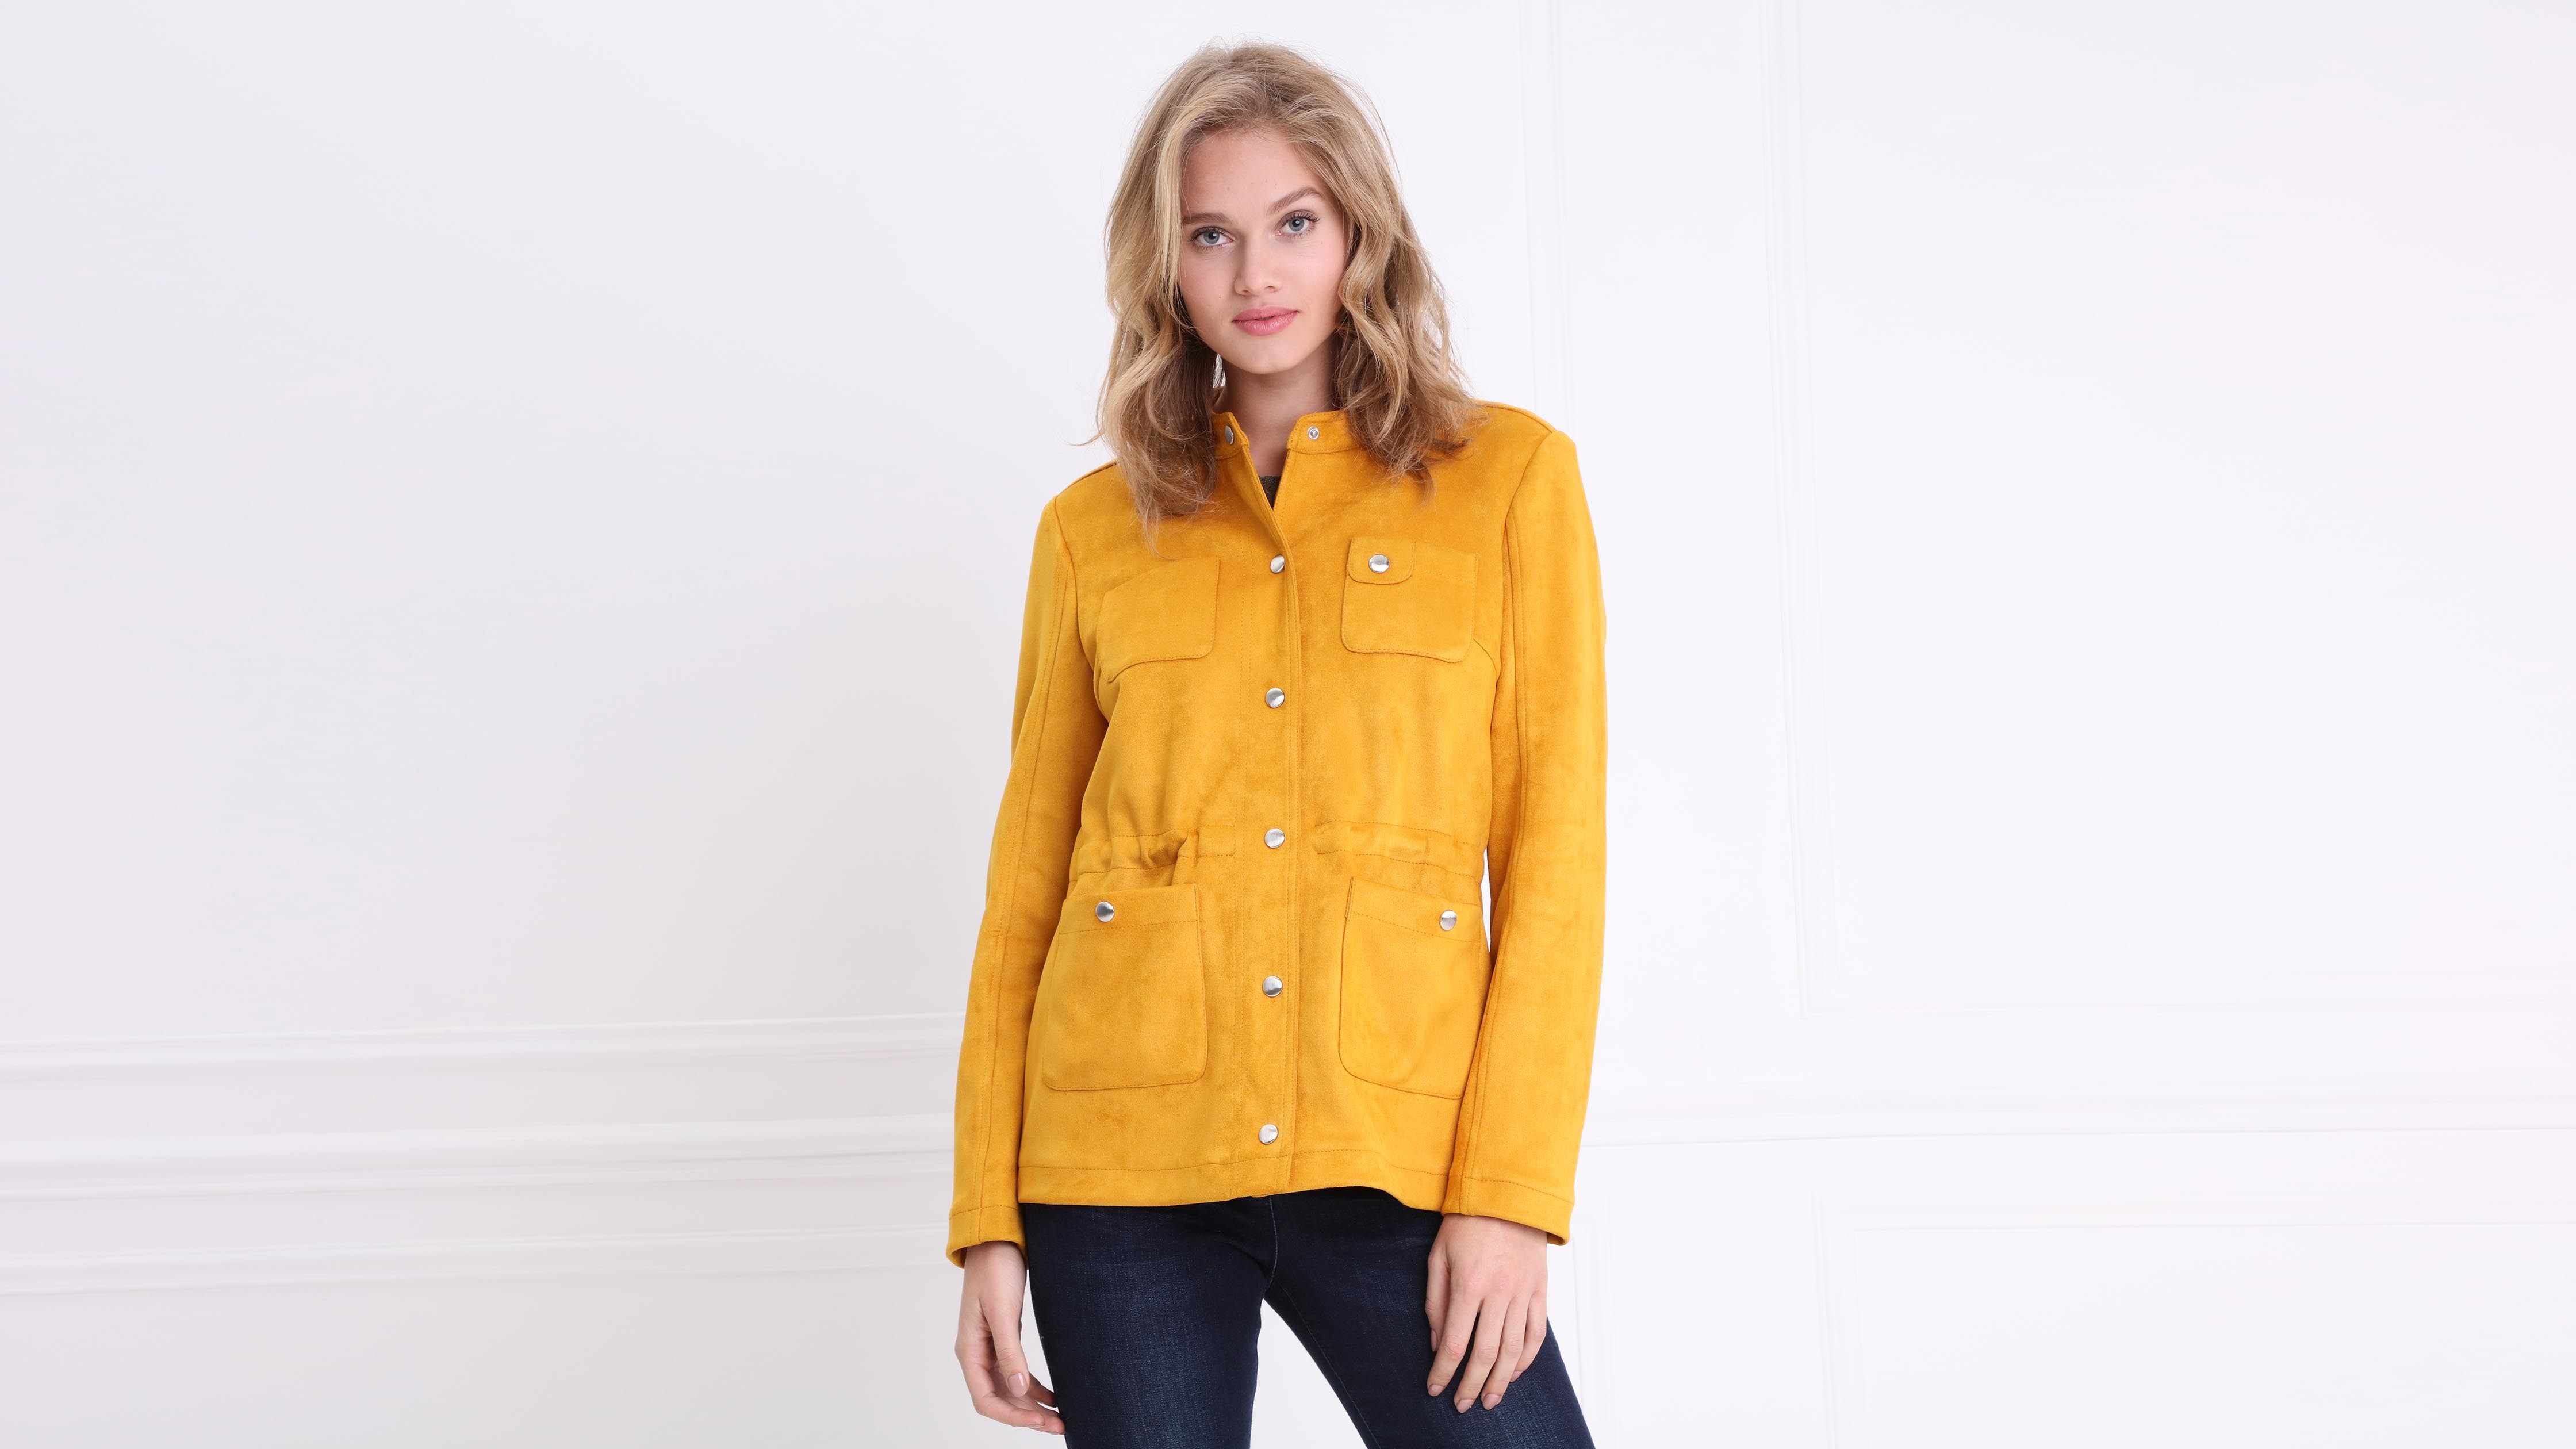 gamuza amarilla para corta dorada Chaqueta de mujer 7g6yIYvmbf